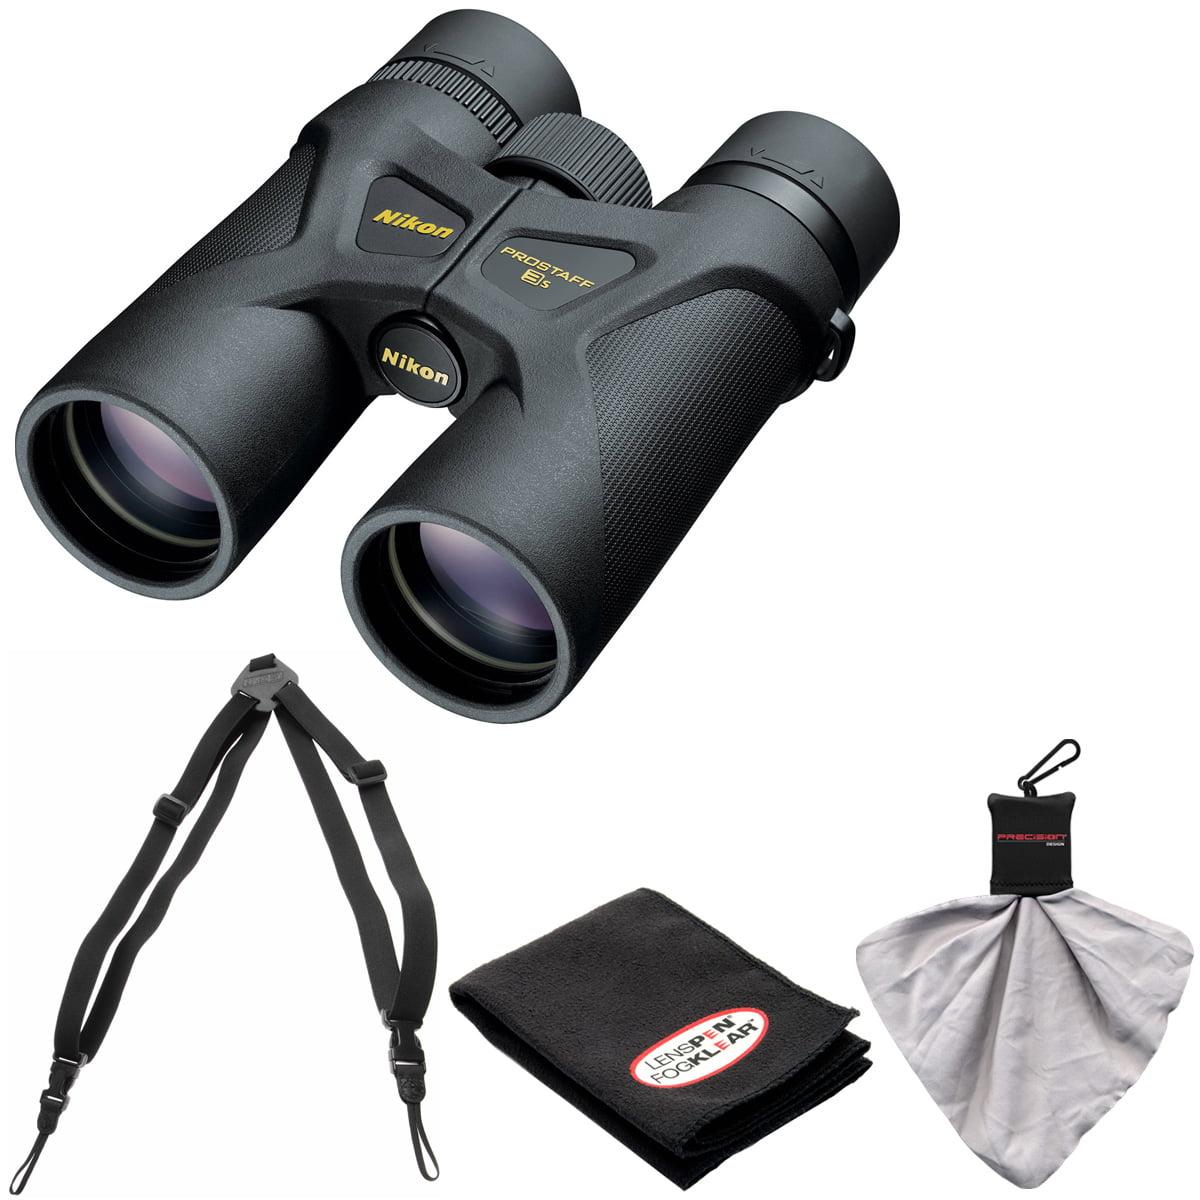 Nikon Prostaff 3S 10x42 Waterproof/Fogproof Binoculars wi...